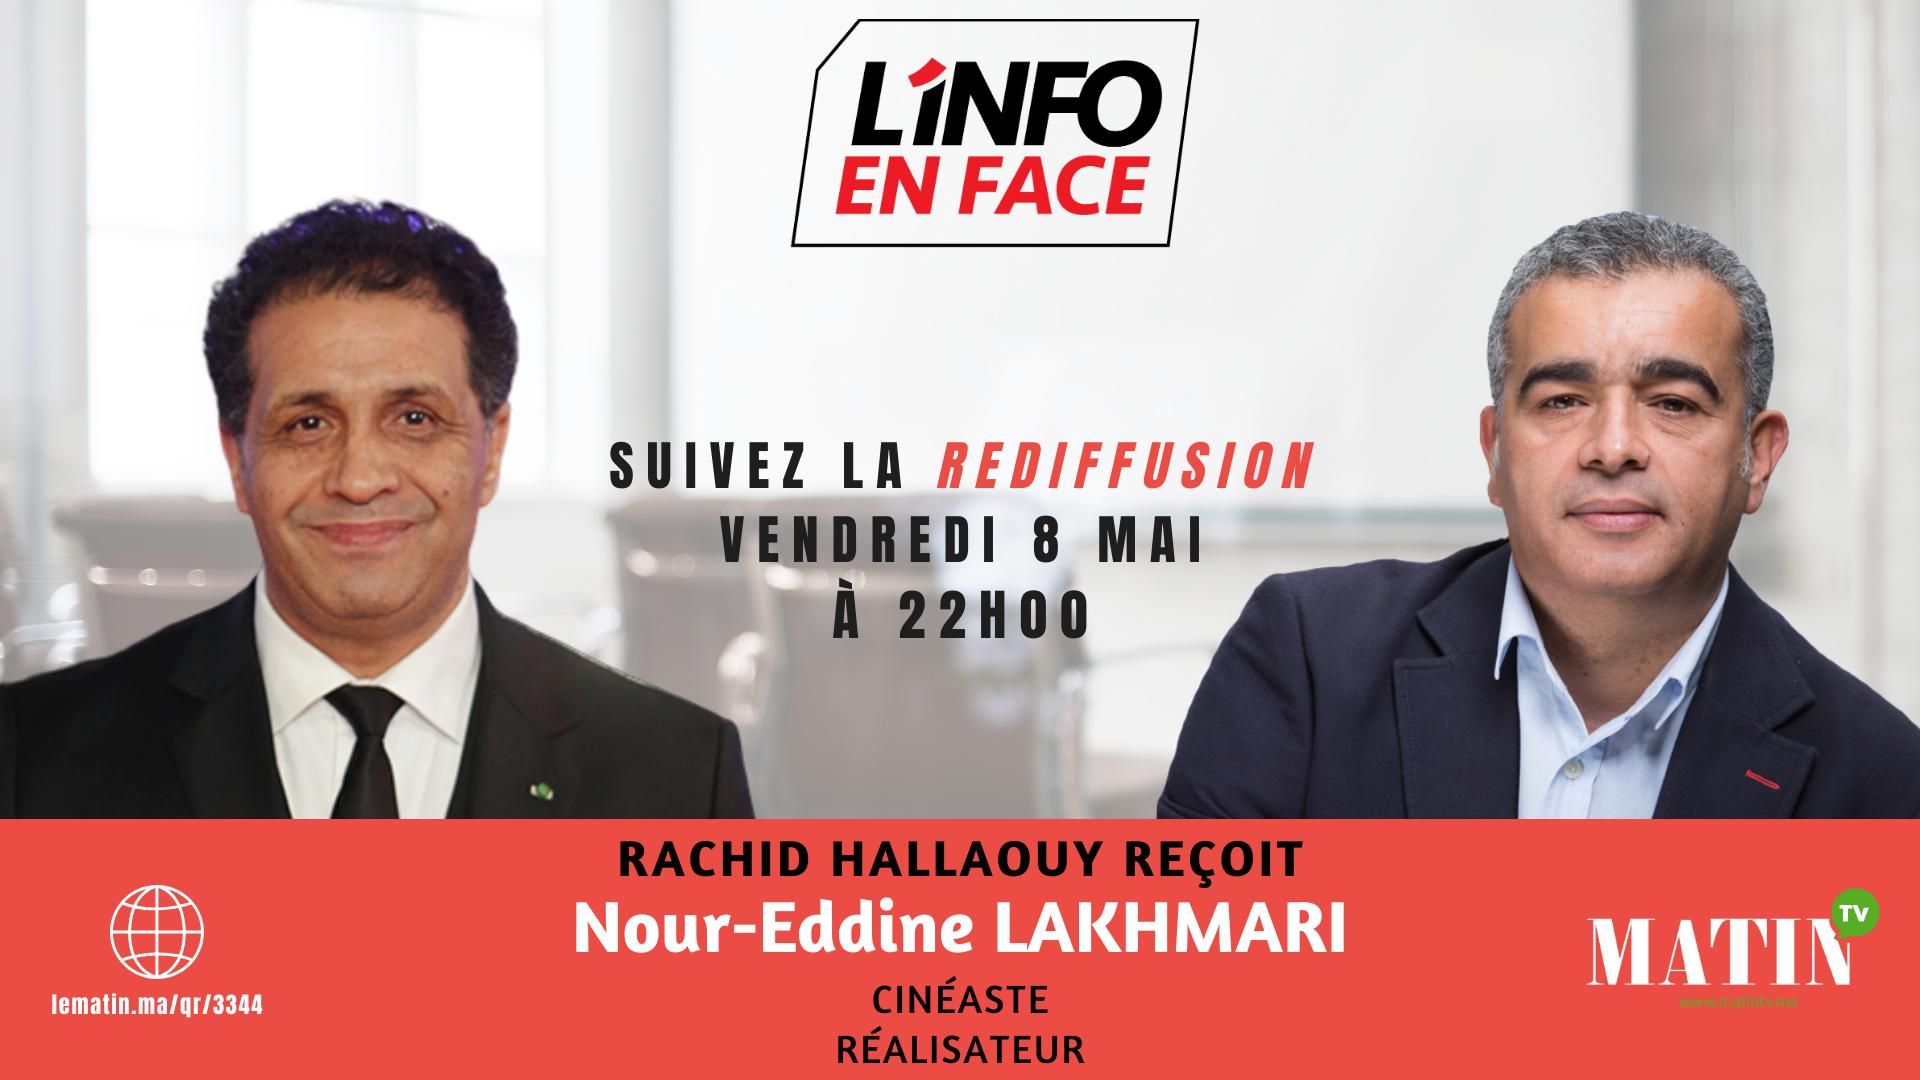 Live : Rediffusion : L'Info en Face avec Nour-Eddine Lakhmari